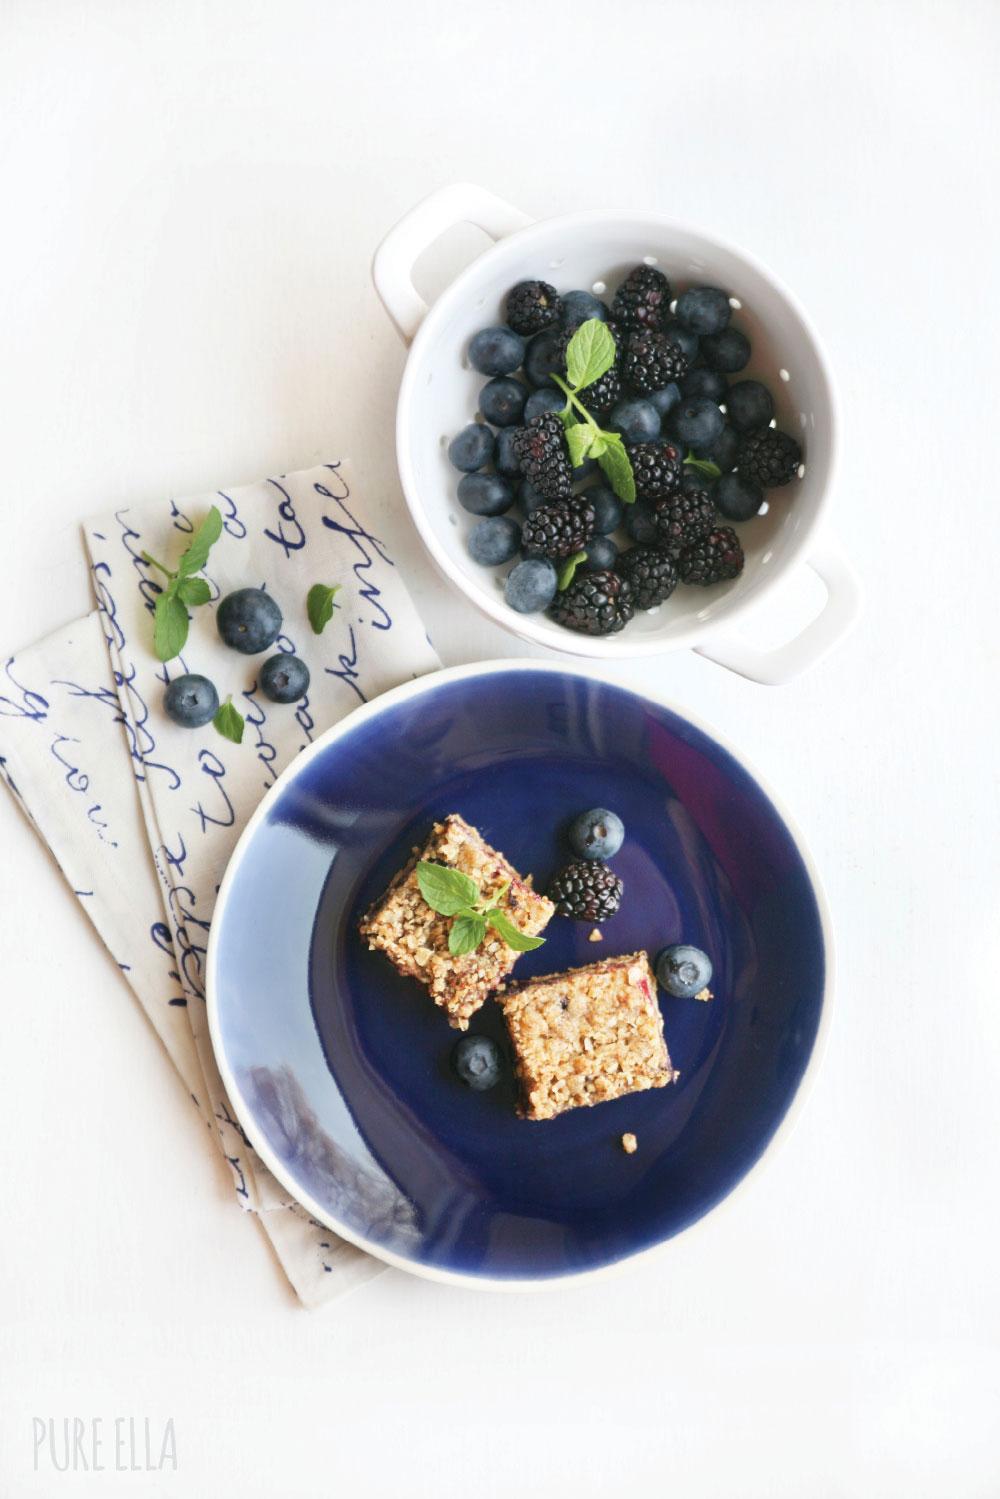 Pure-Ella-gluten-free-vegan-blueberry-blackberry-crumb-squares11